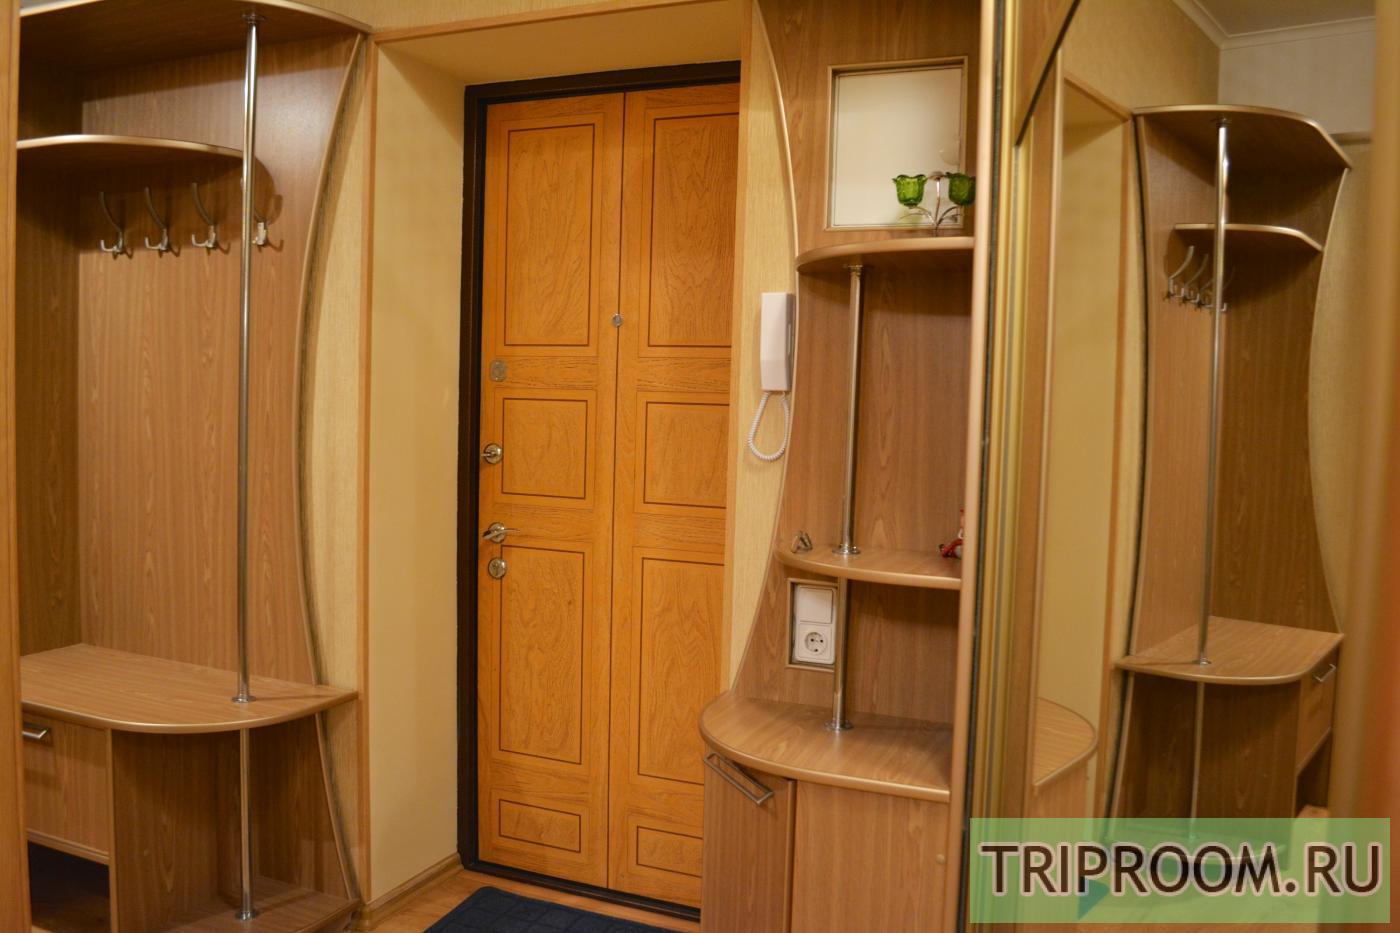 1-комнатная квартира посуточно (вариант № 5487), ул. Кропоткина улица, фото № 10